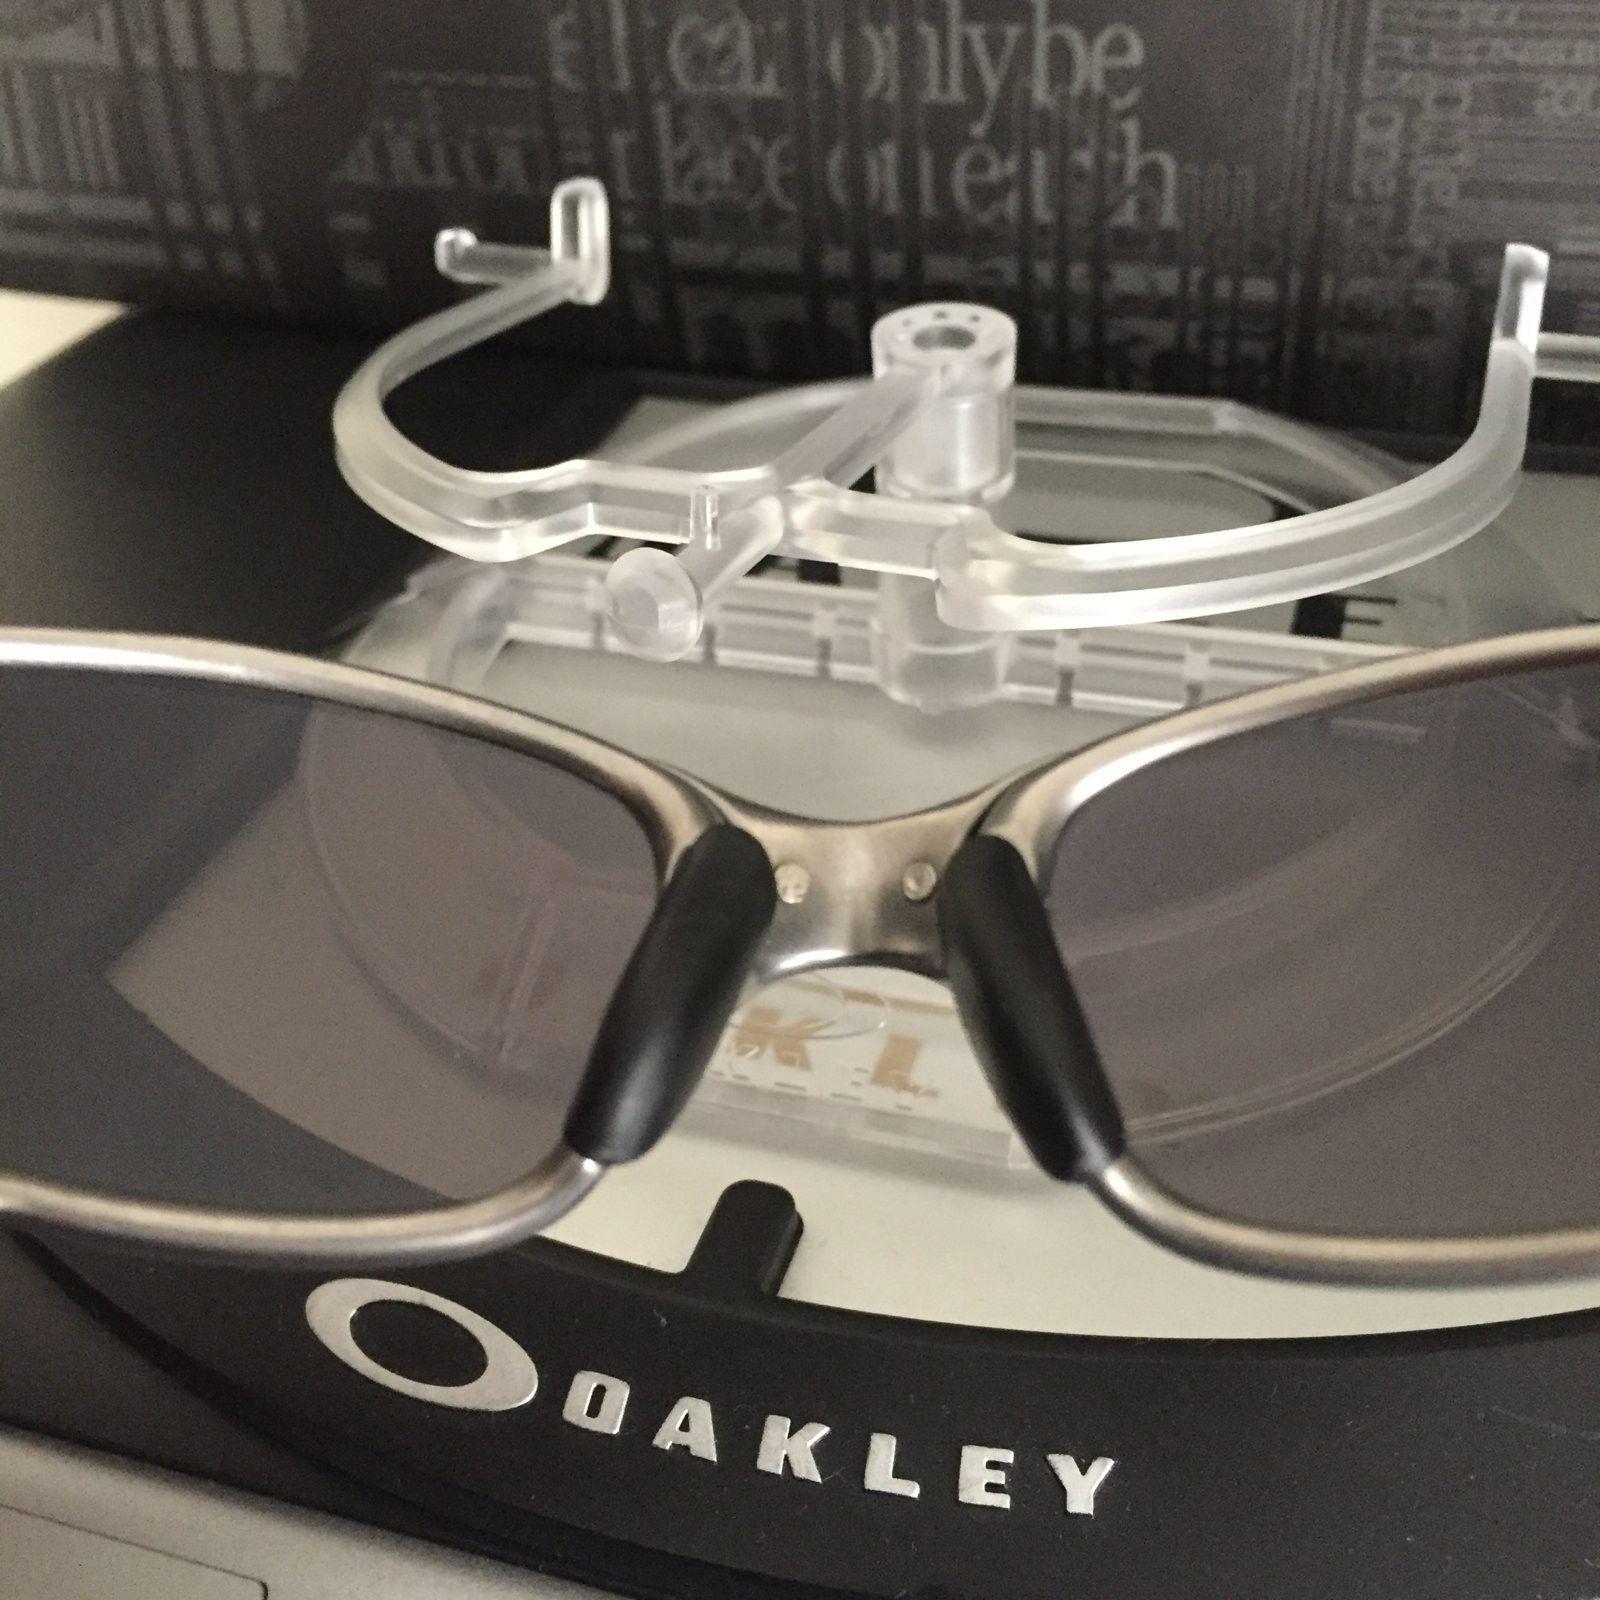 oakley juliet plasma good price - IMG_4928.JPG